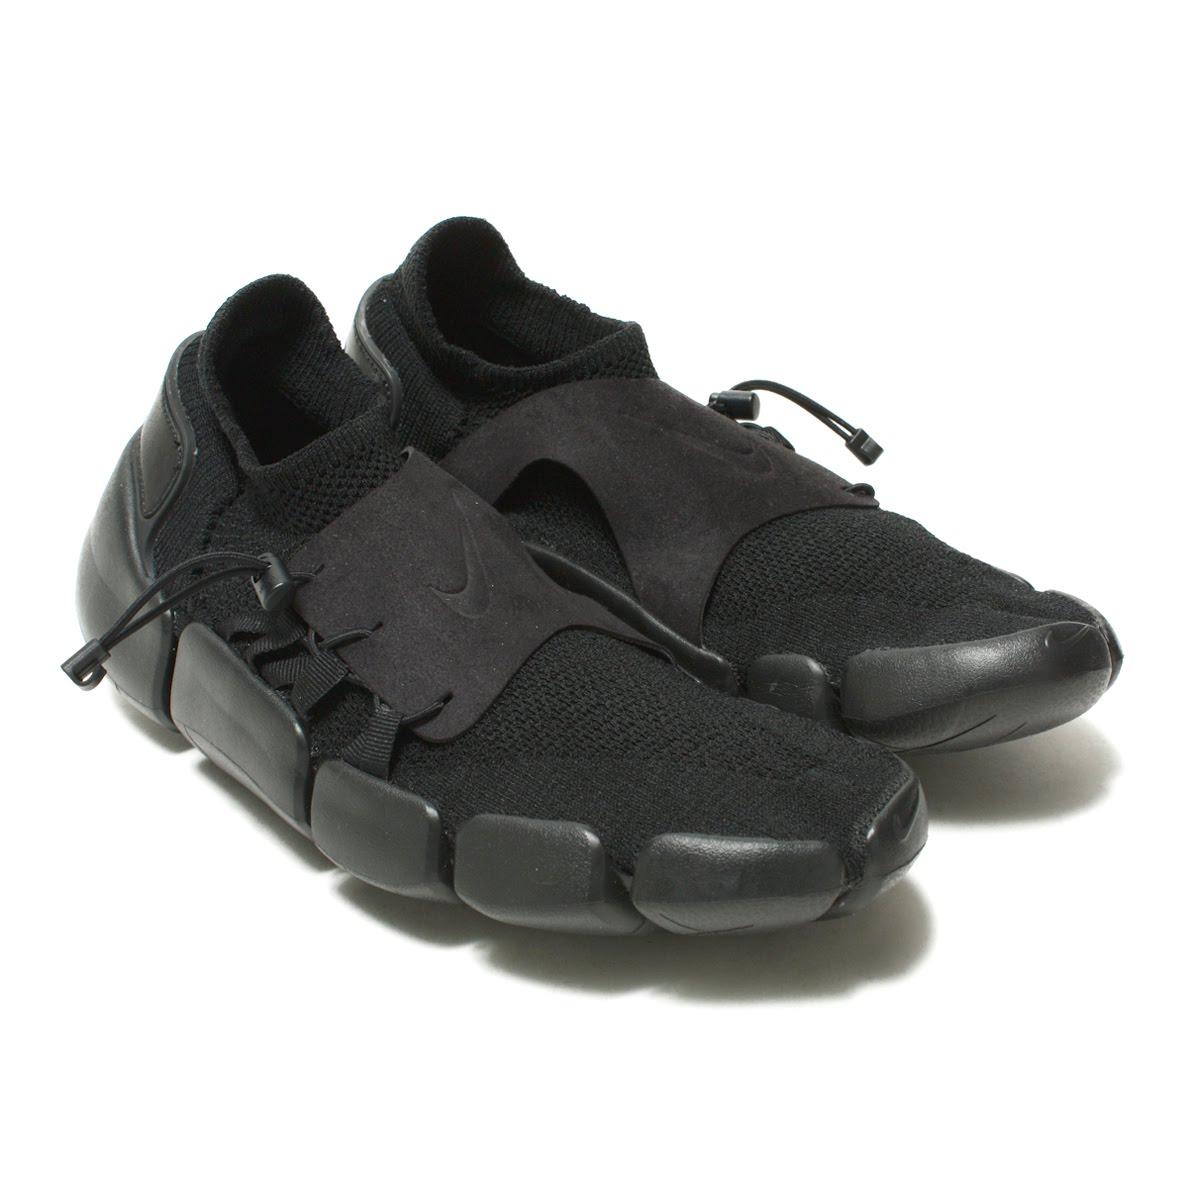 NIKE FOOTSCAPE FLYKNIT DM(ナイキ フットスケープ フライニット DM)BLACK/BLACK-BLACK【メンズ レディース スニーカー】18SP-I